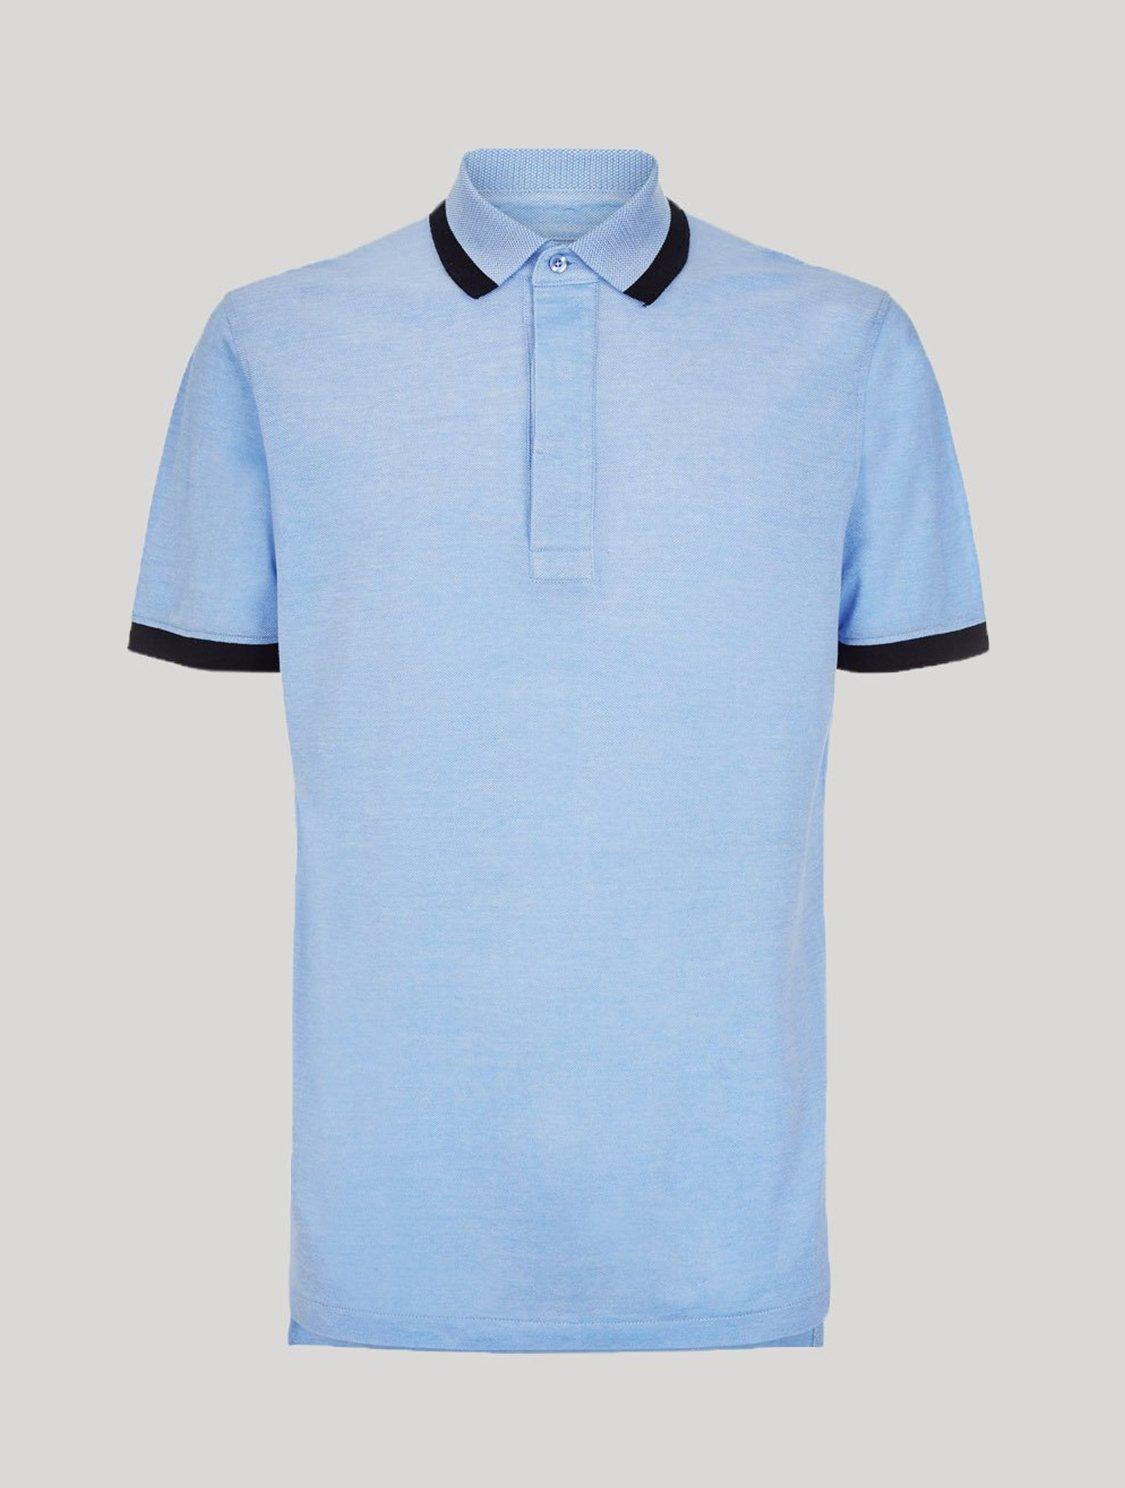 Constantino Shirt Blue XXXL